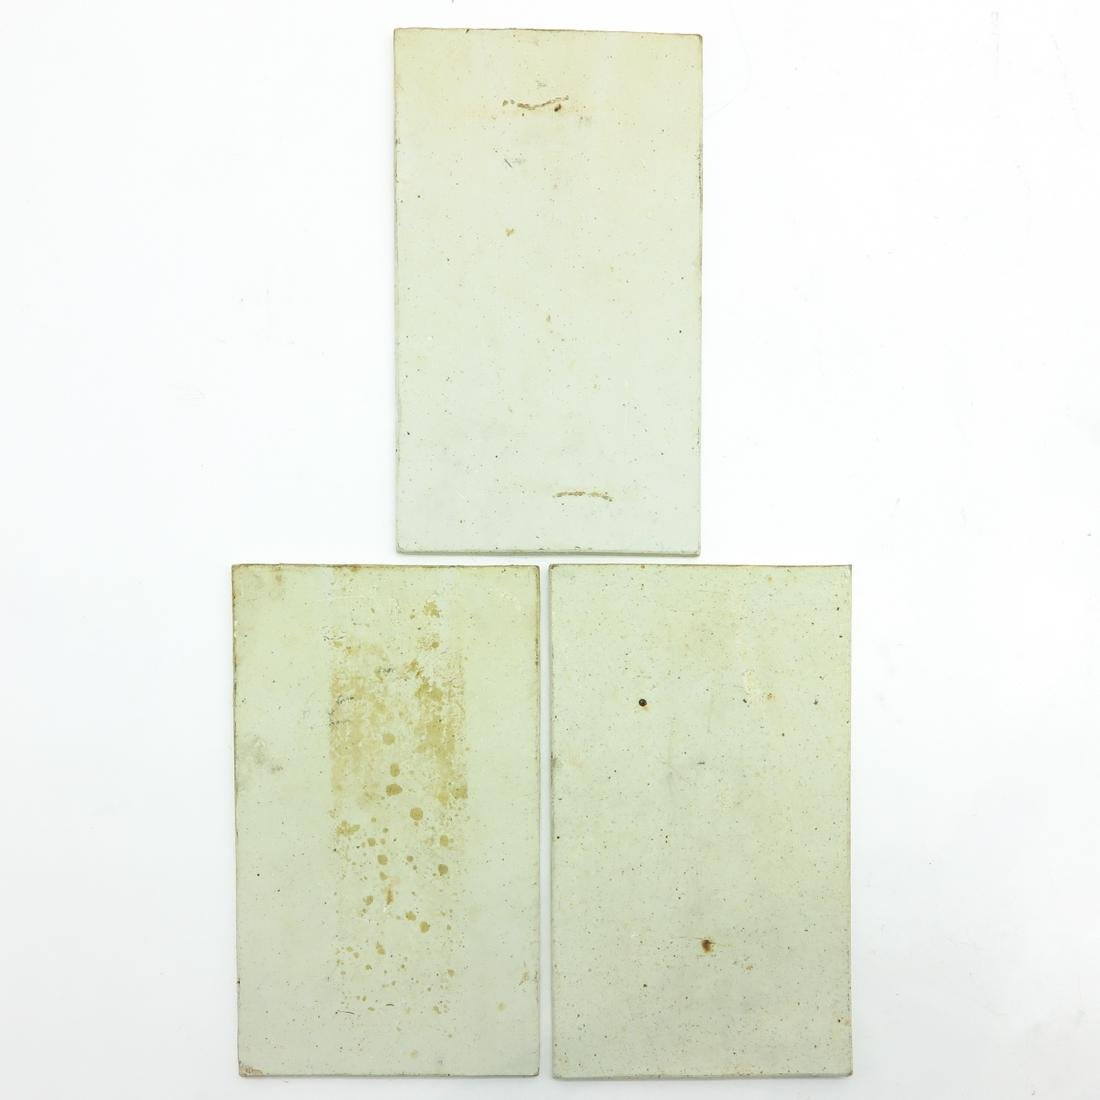 Lot of 3 Tiles - 2